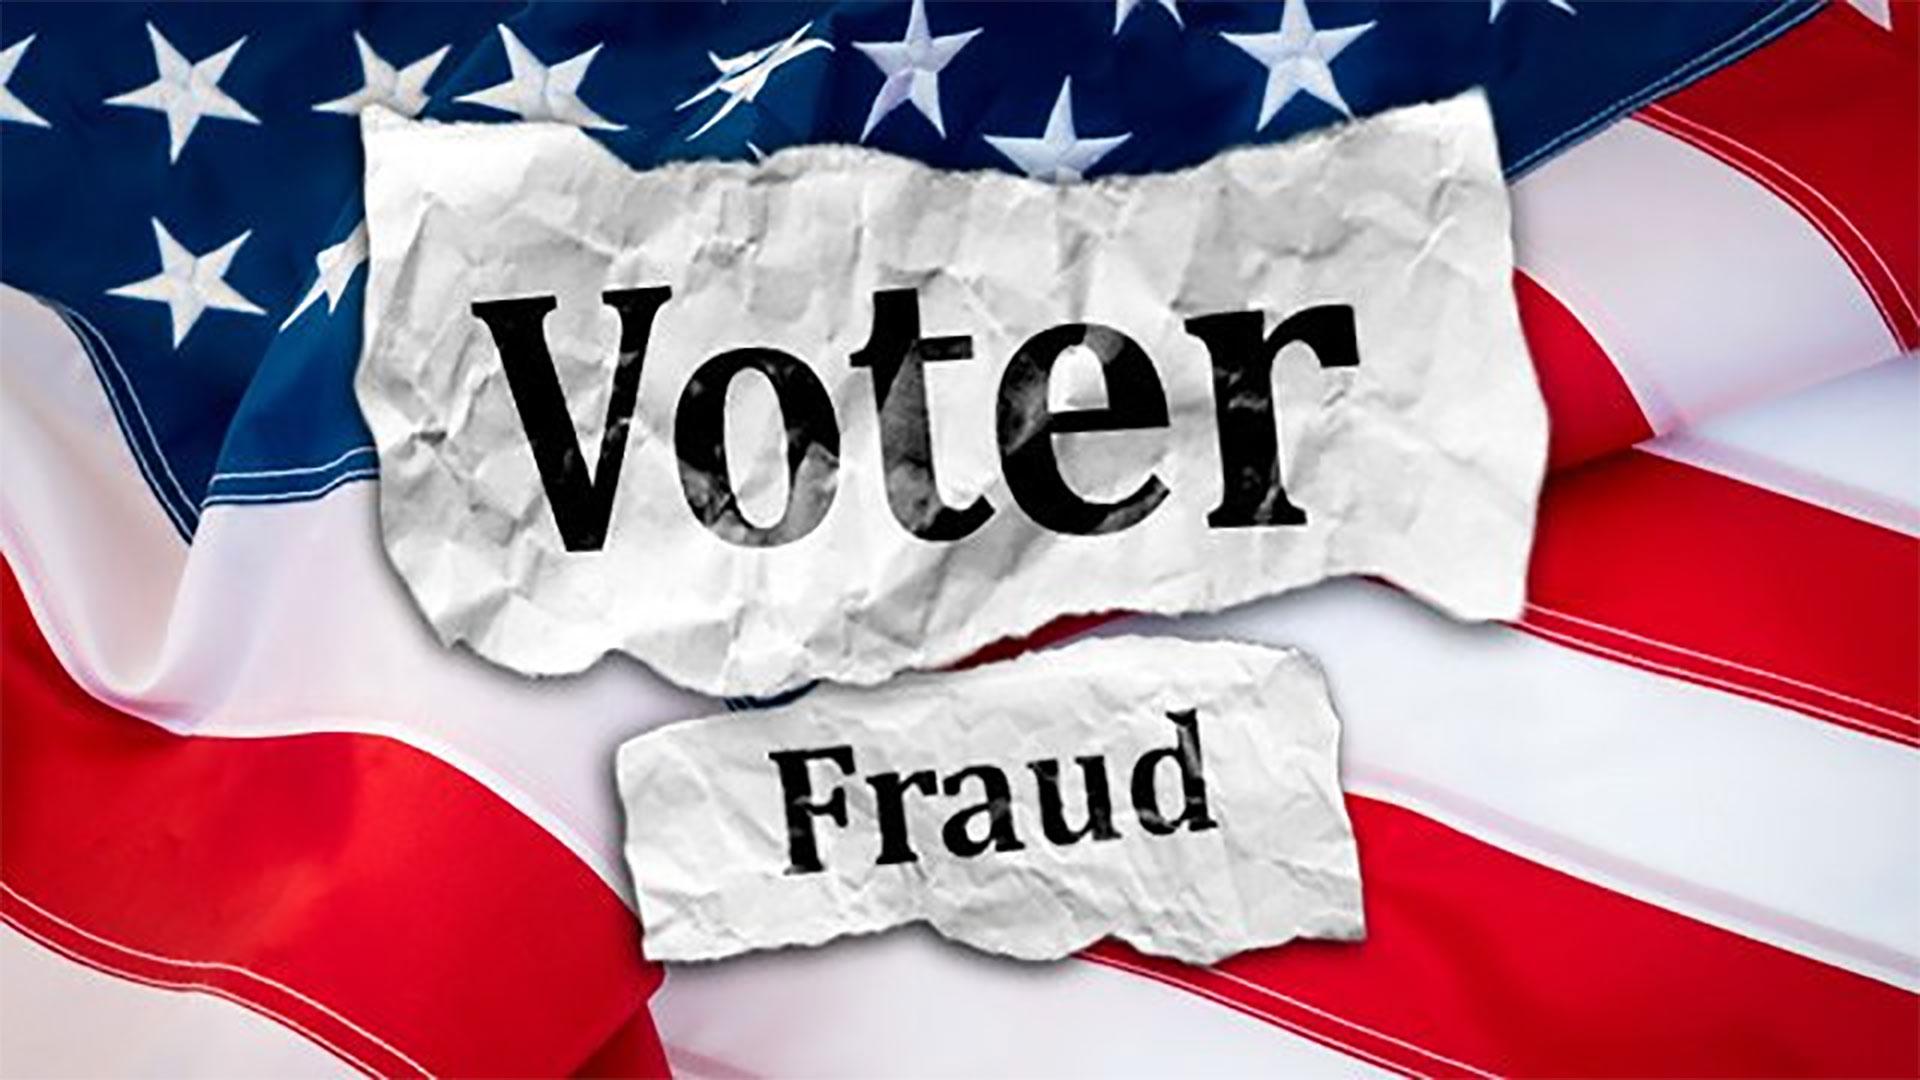 Voter Fraud & Election Meddling Evidence Floods Social Media